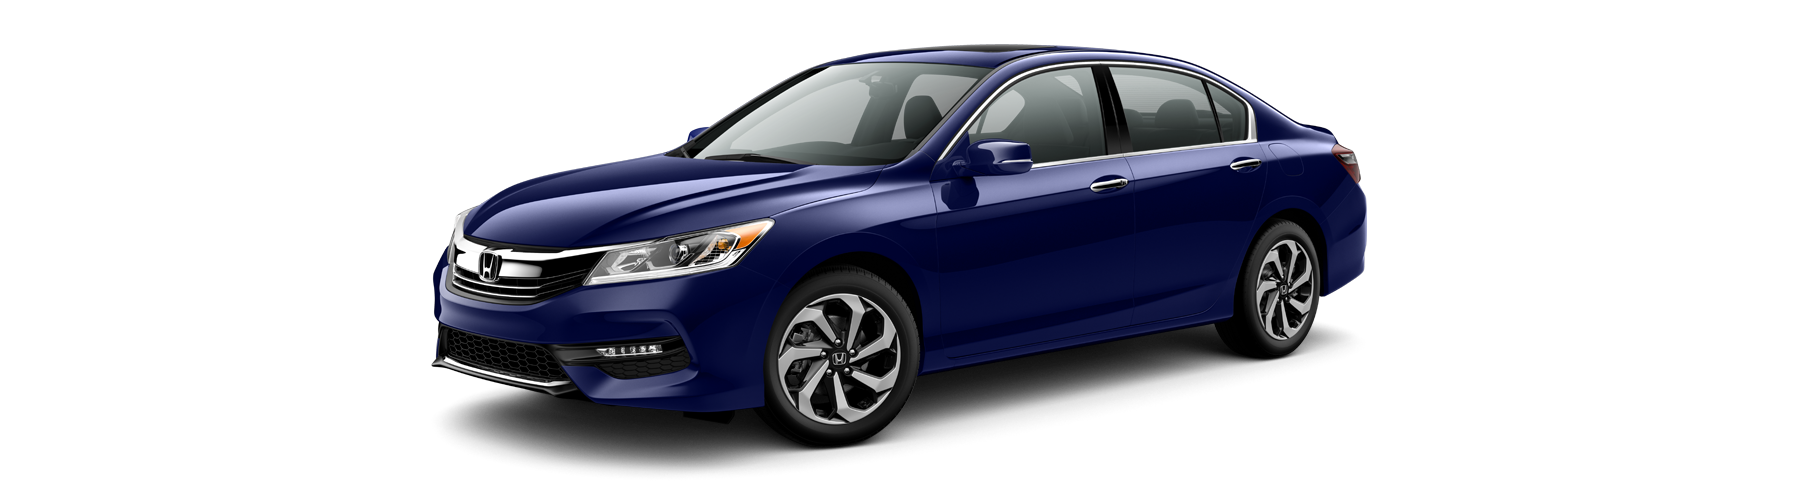 2017 Honda Accord Sedan Front Angle